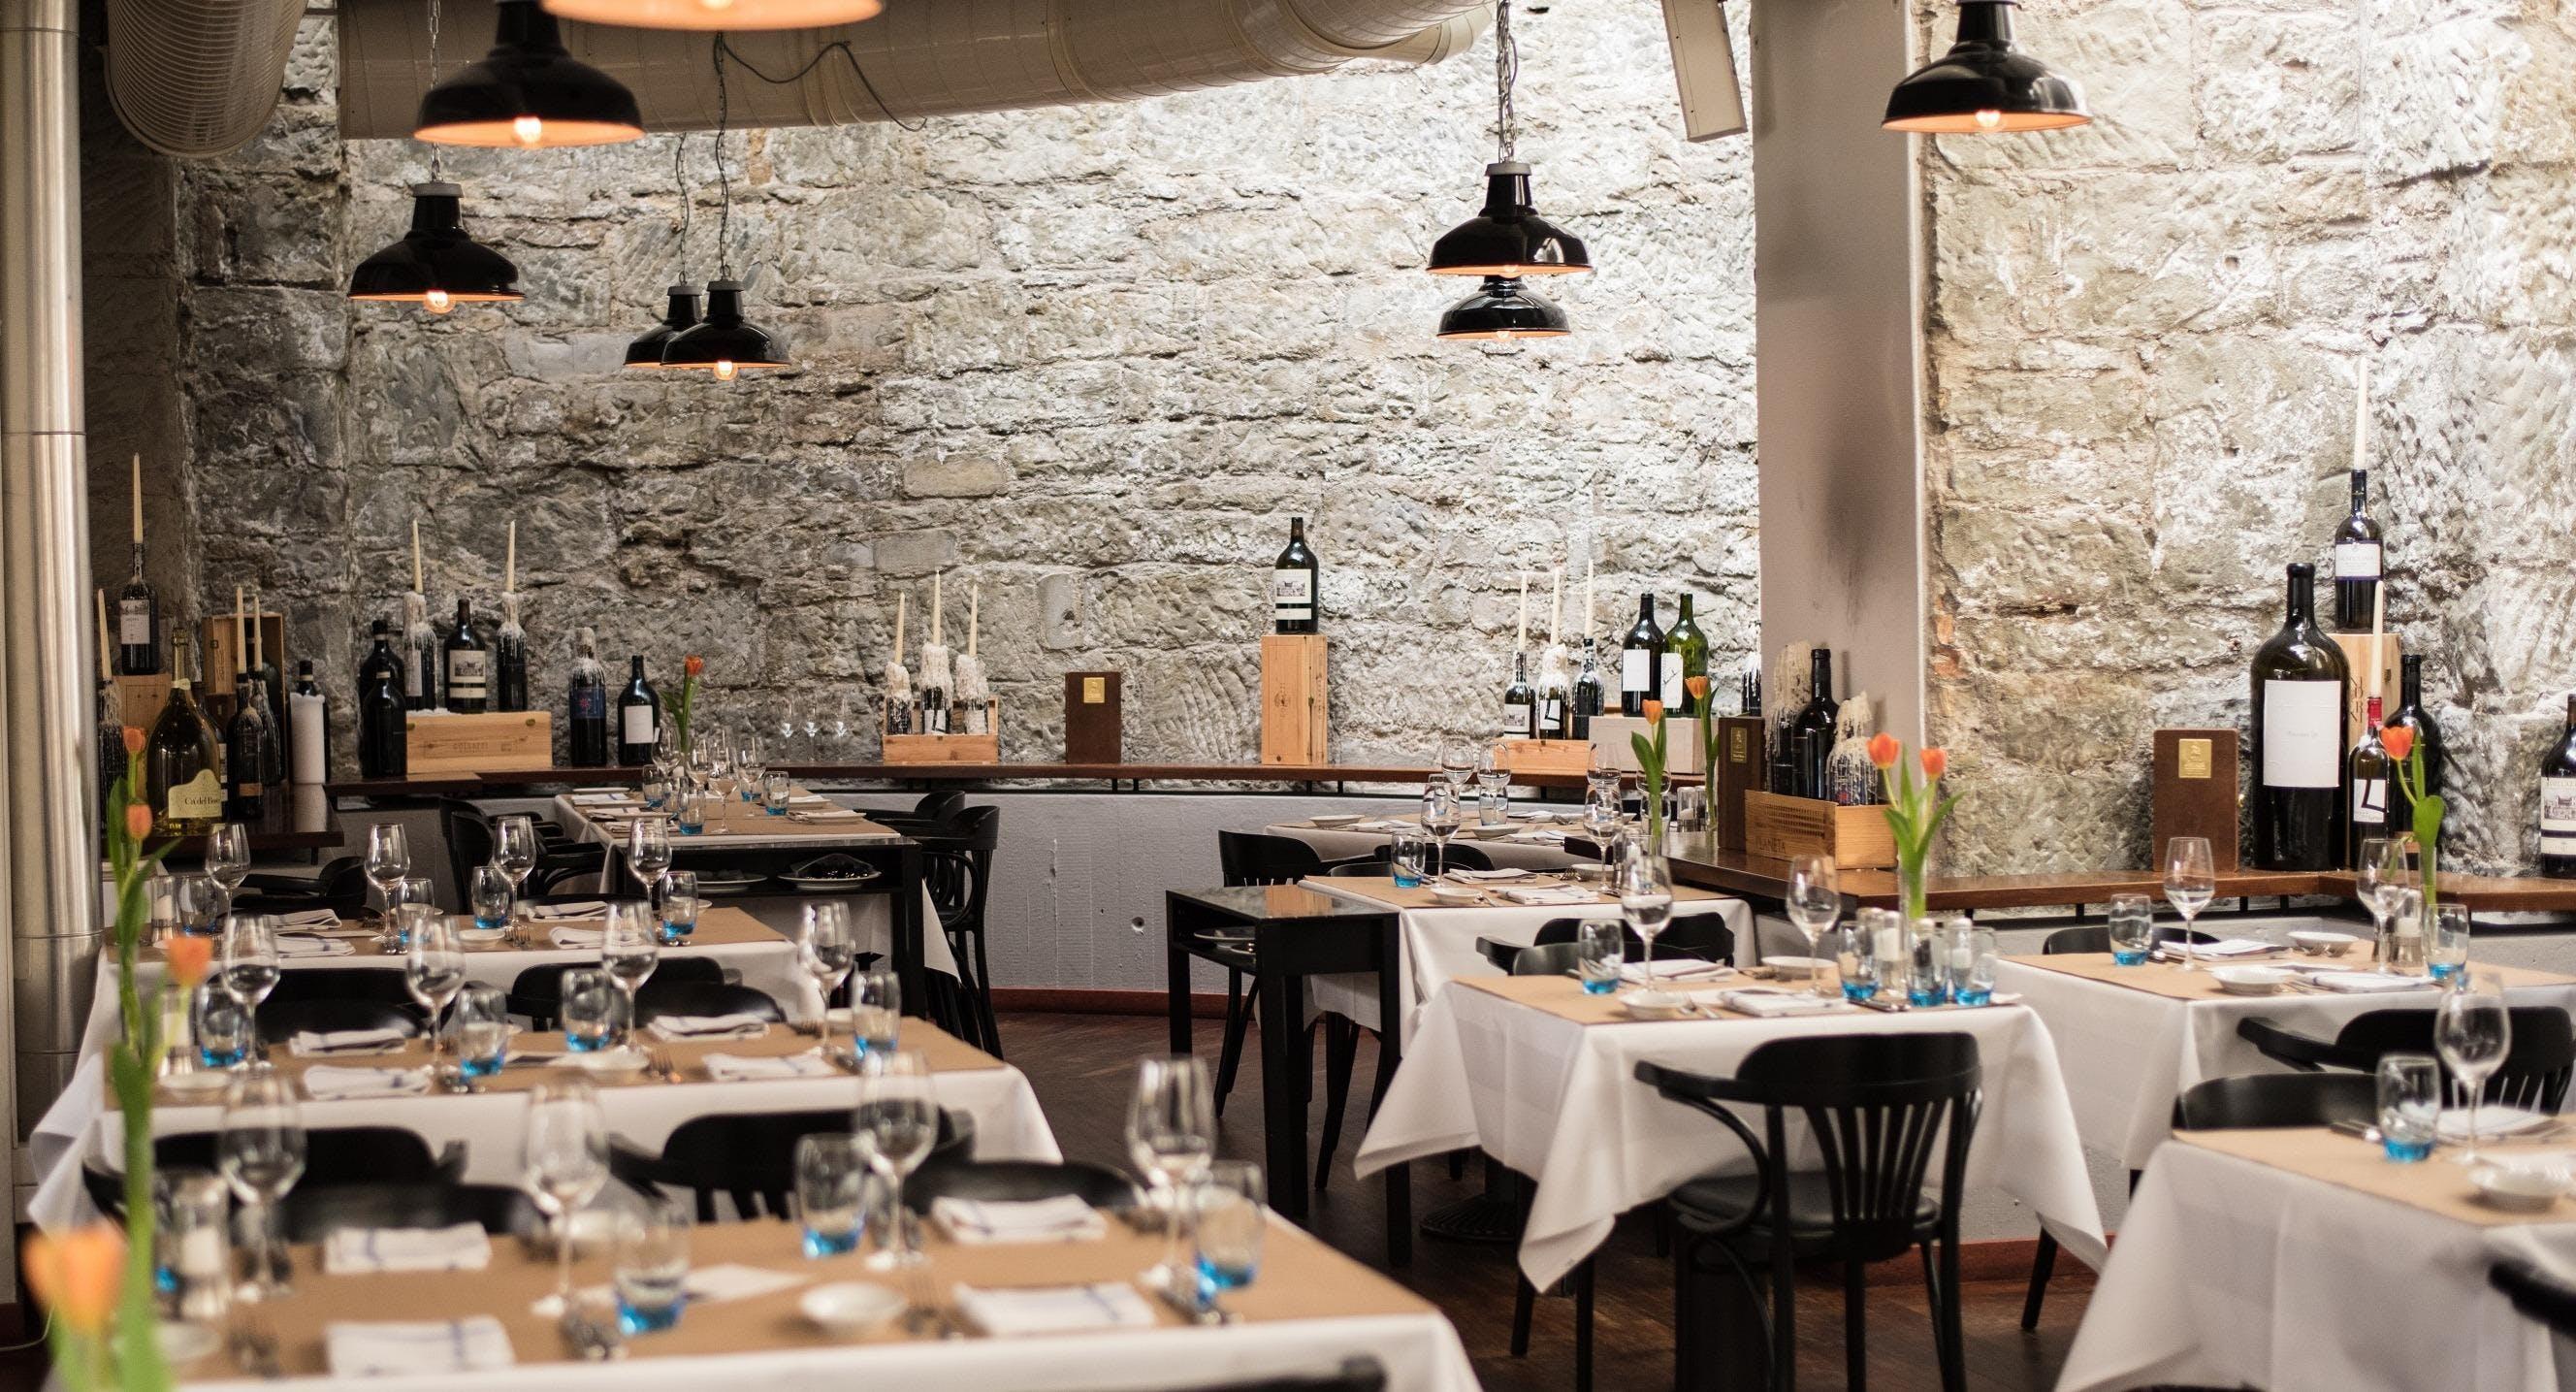 Restaurant Blaue Ente